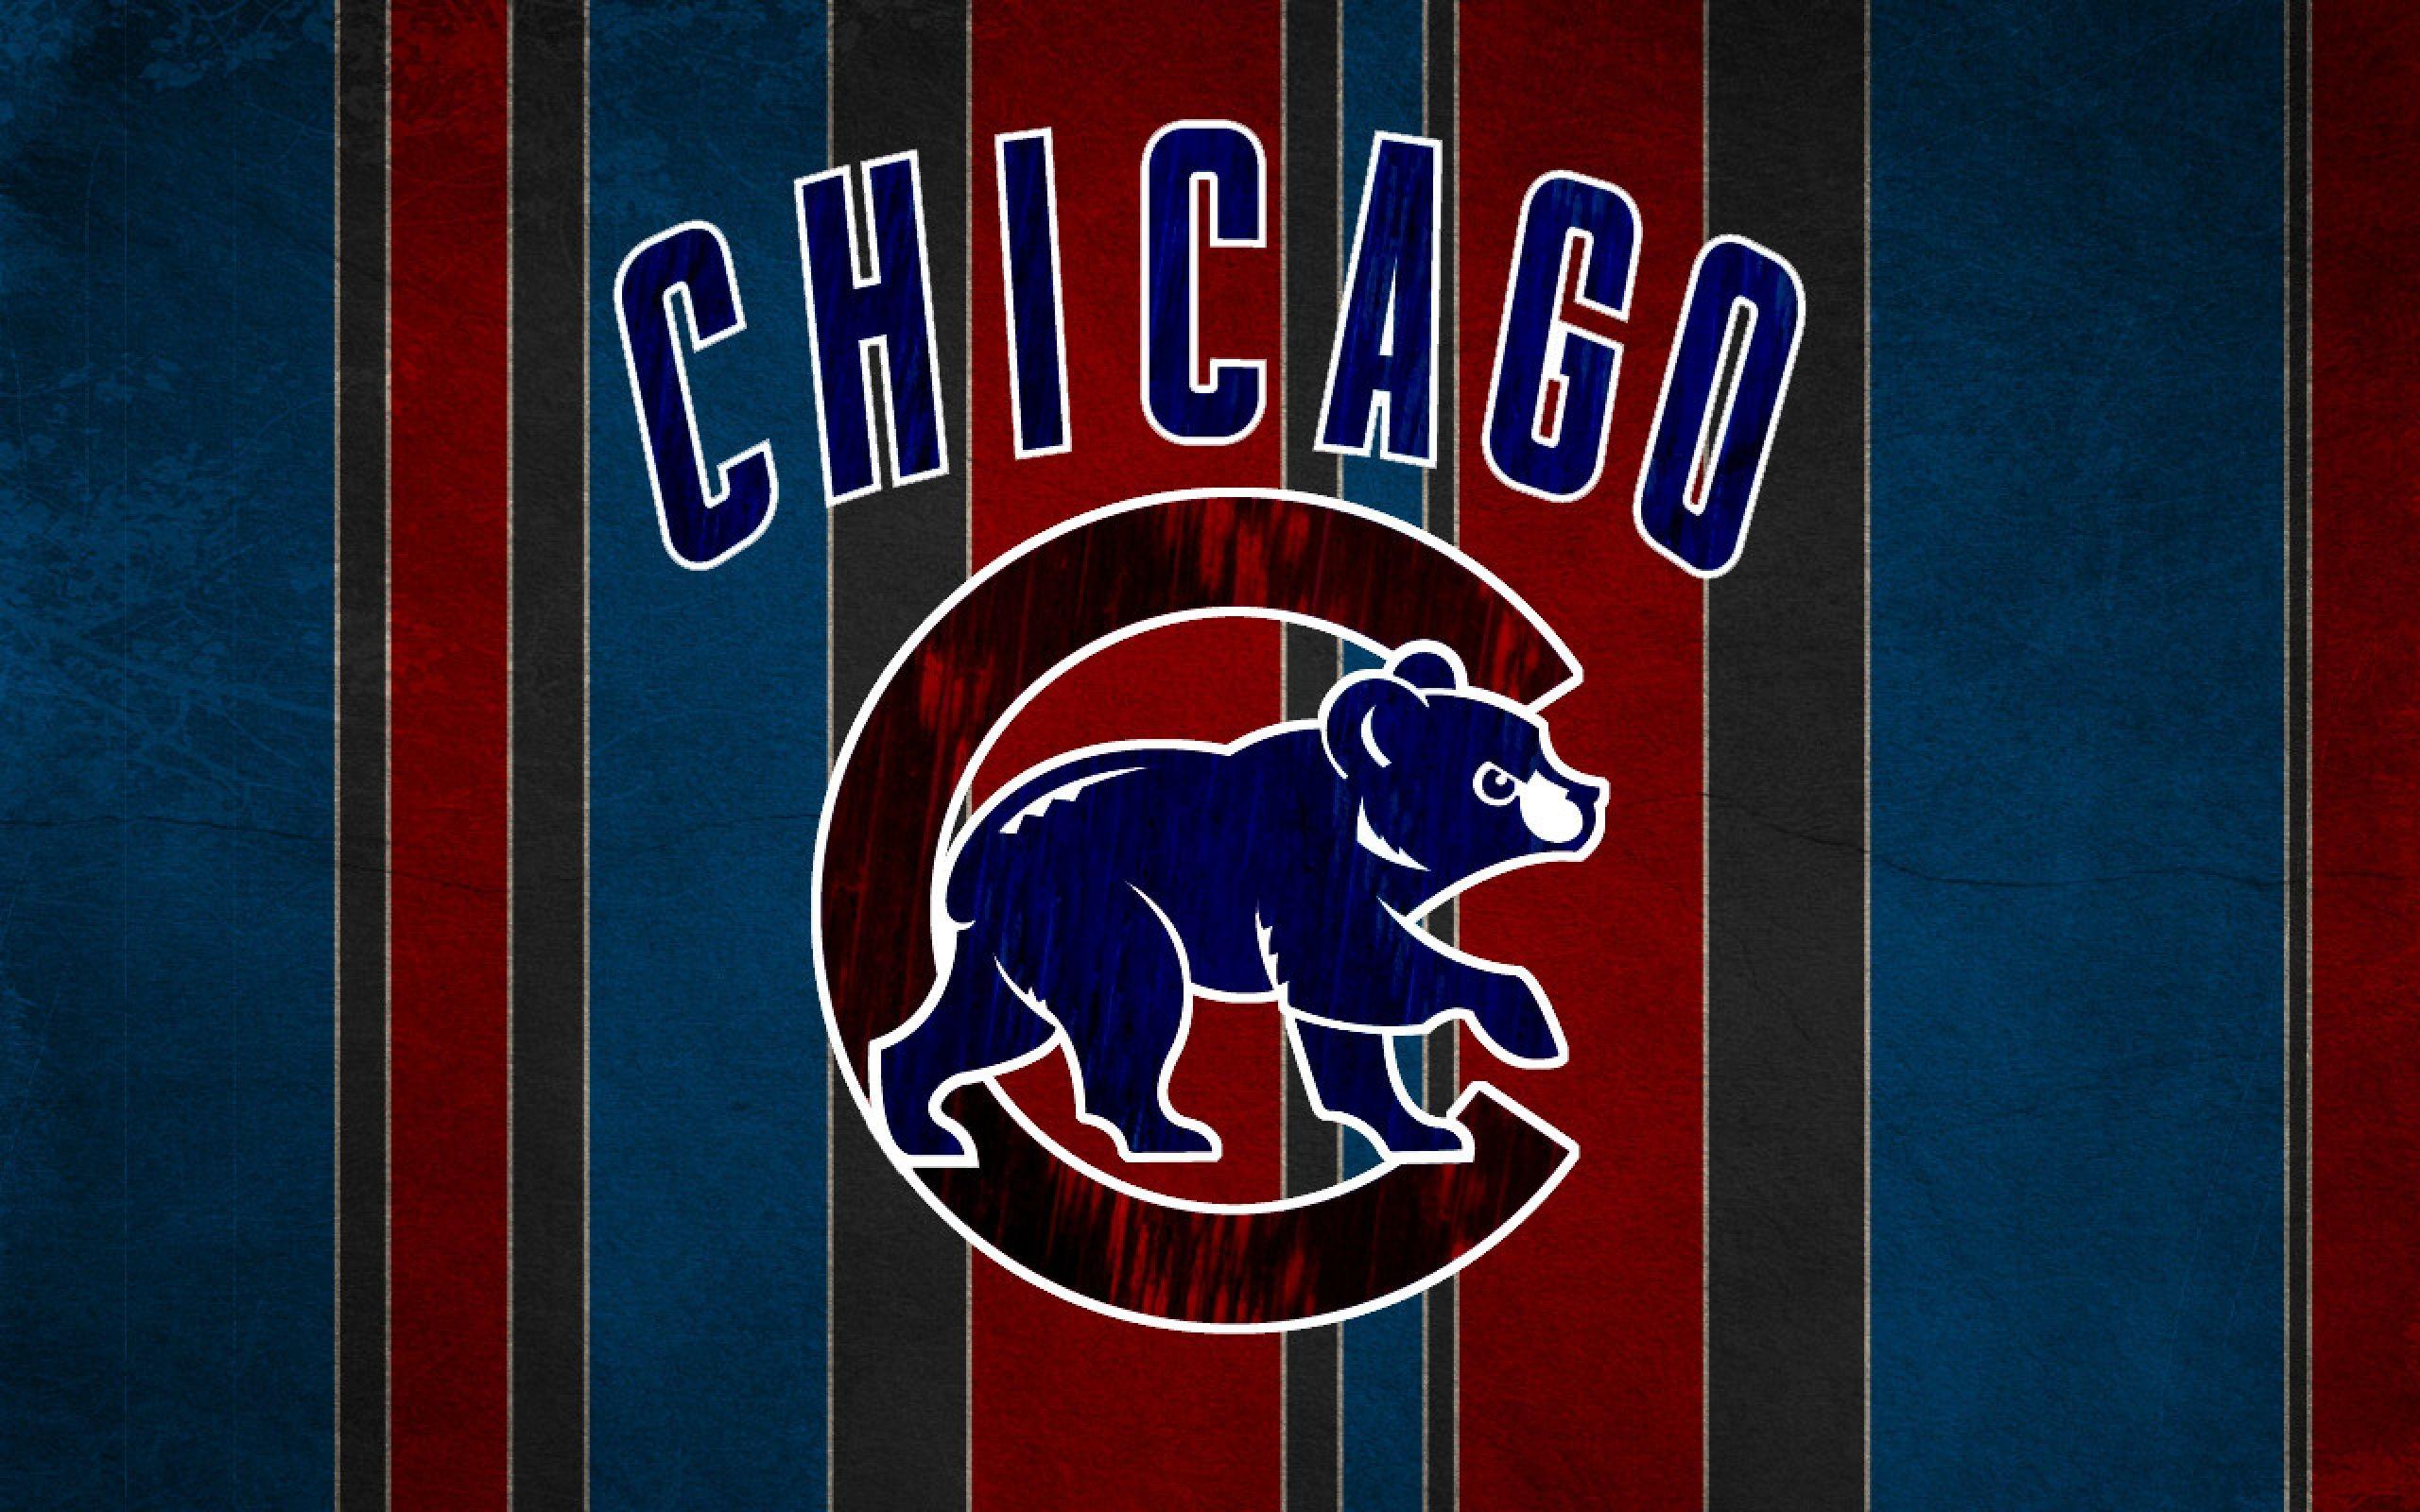 CHICAGO CUBS mlb baseball (58) wallpaper | | 232586 .